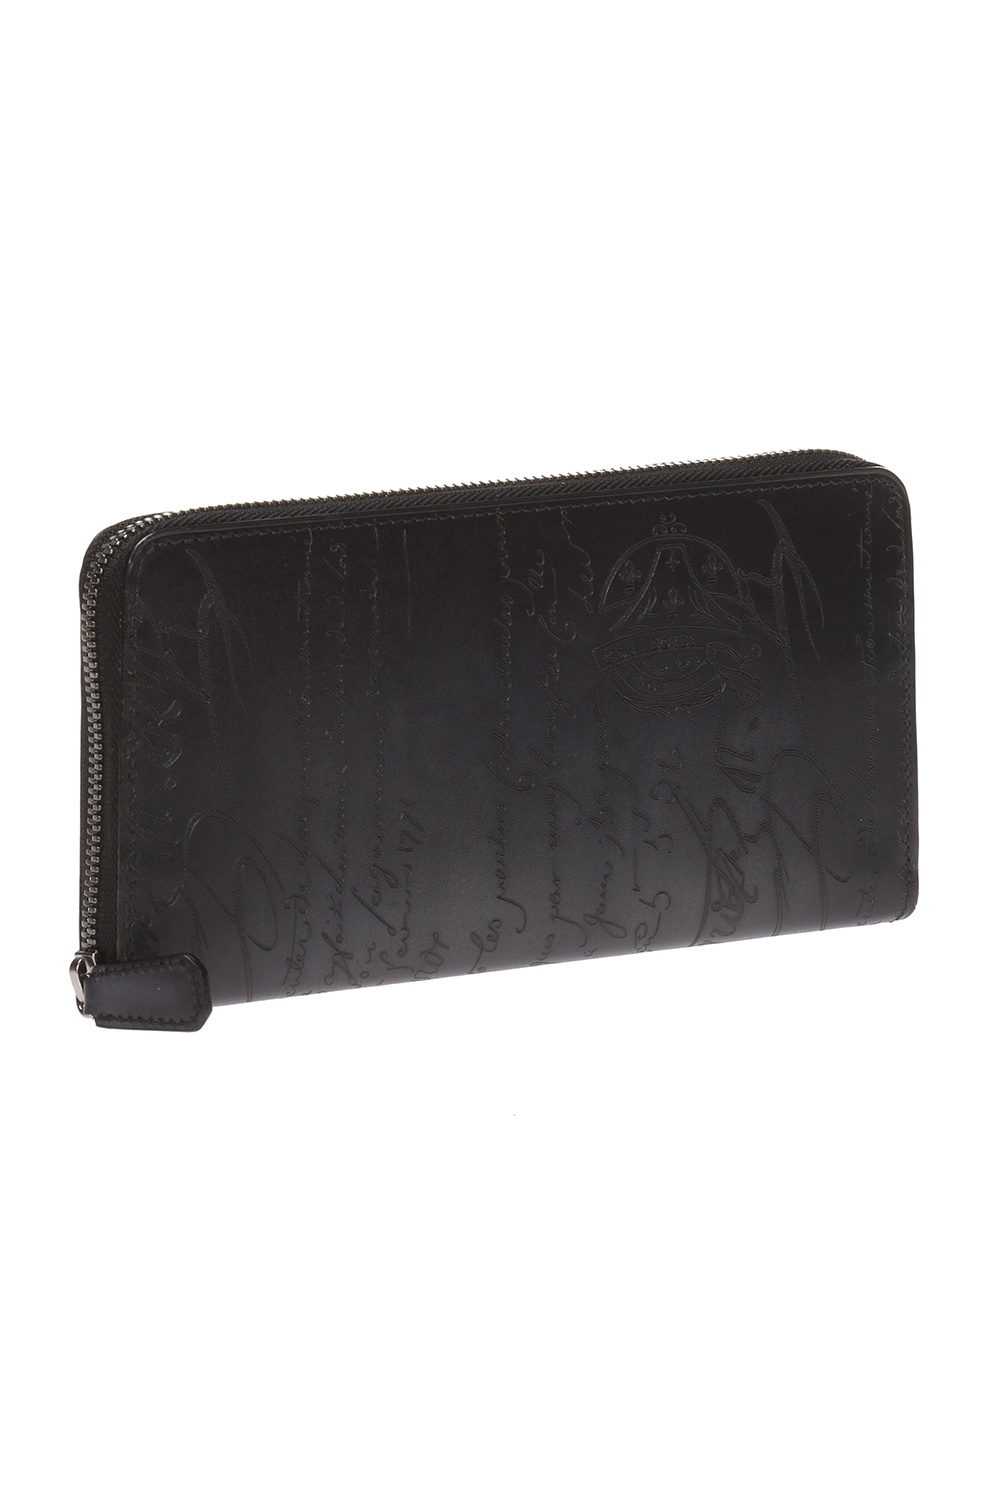 Berluti 'Itauba' wallet